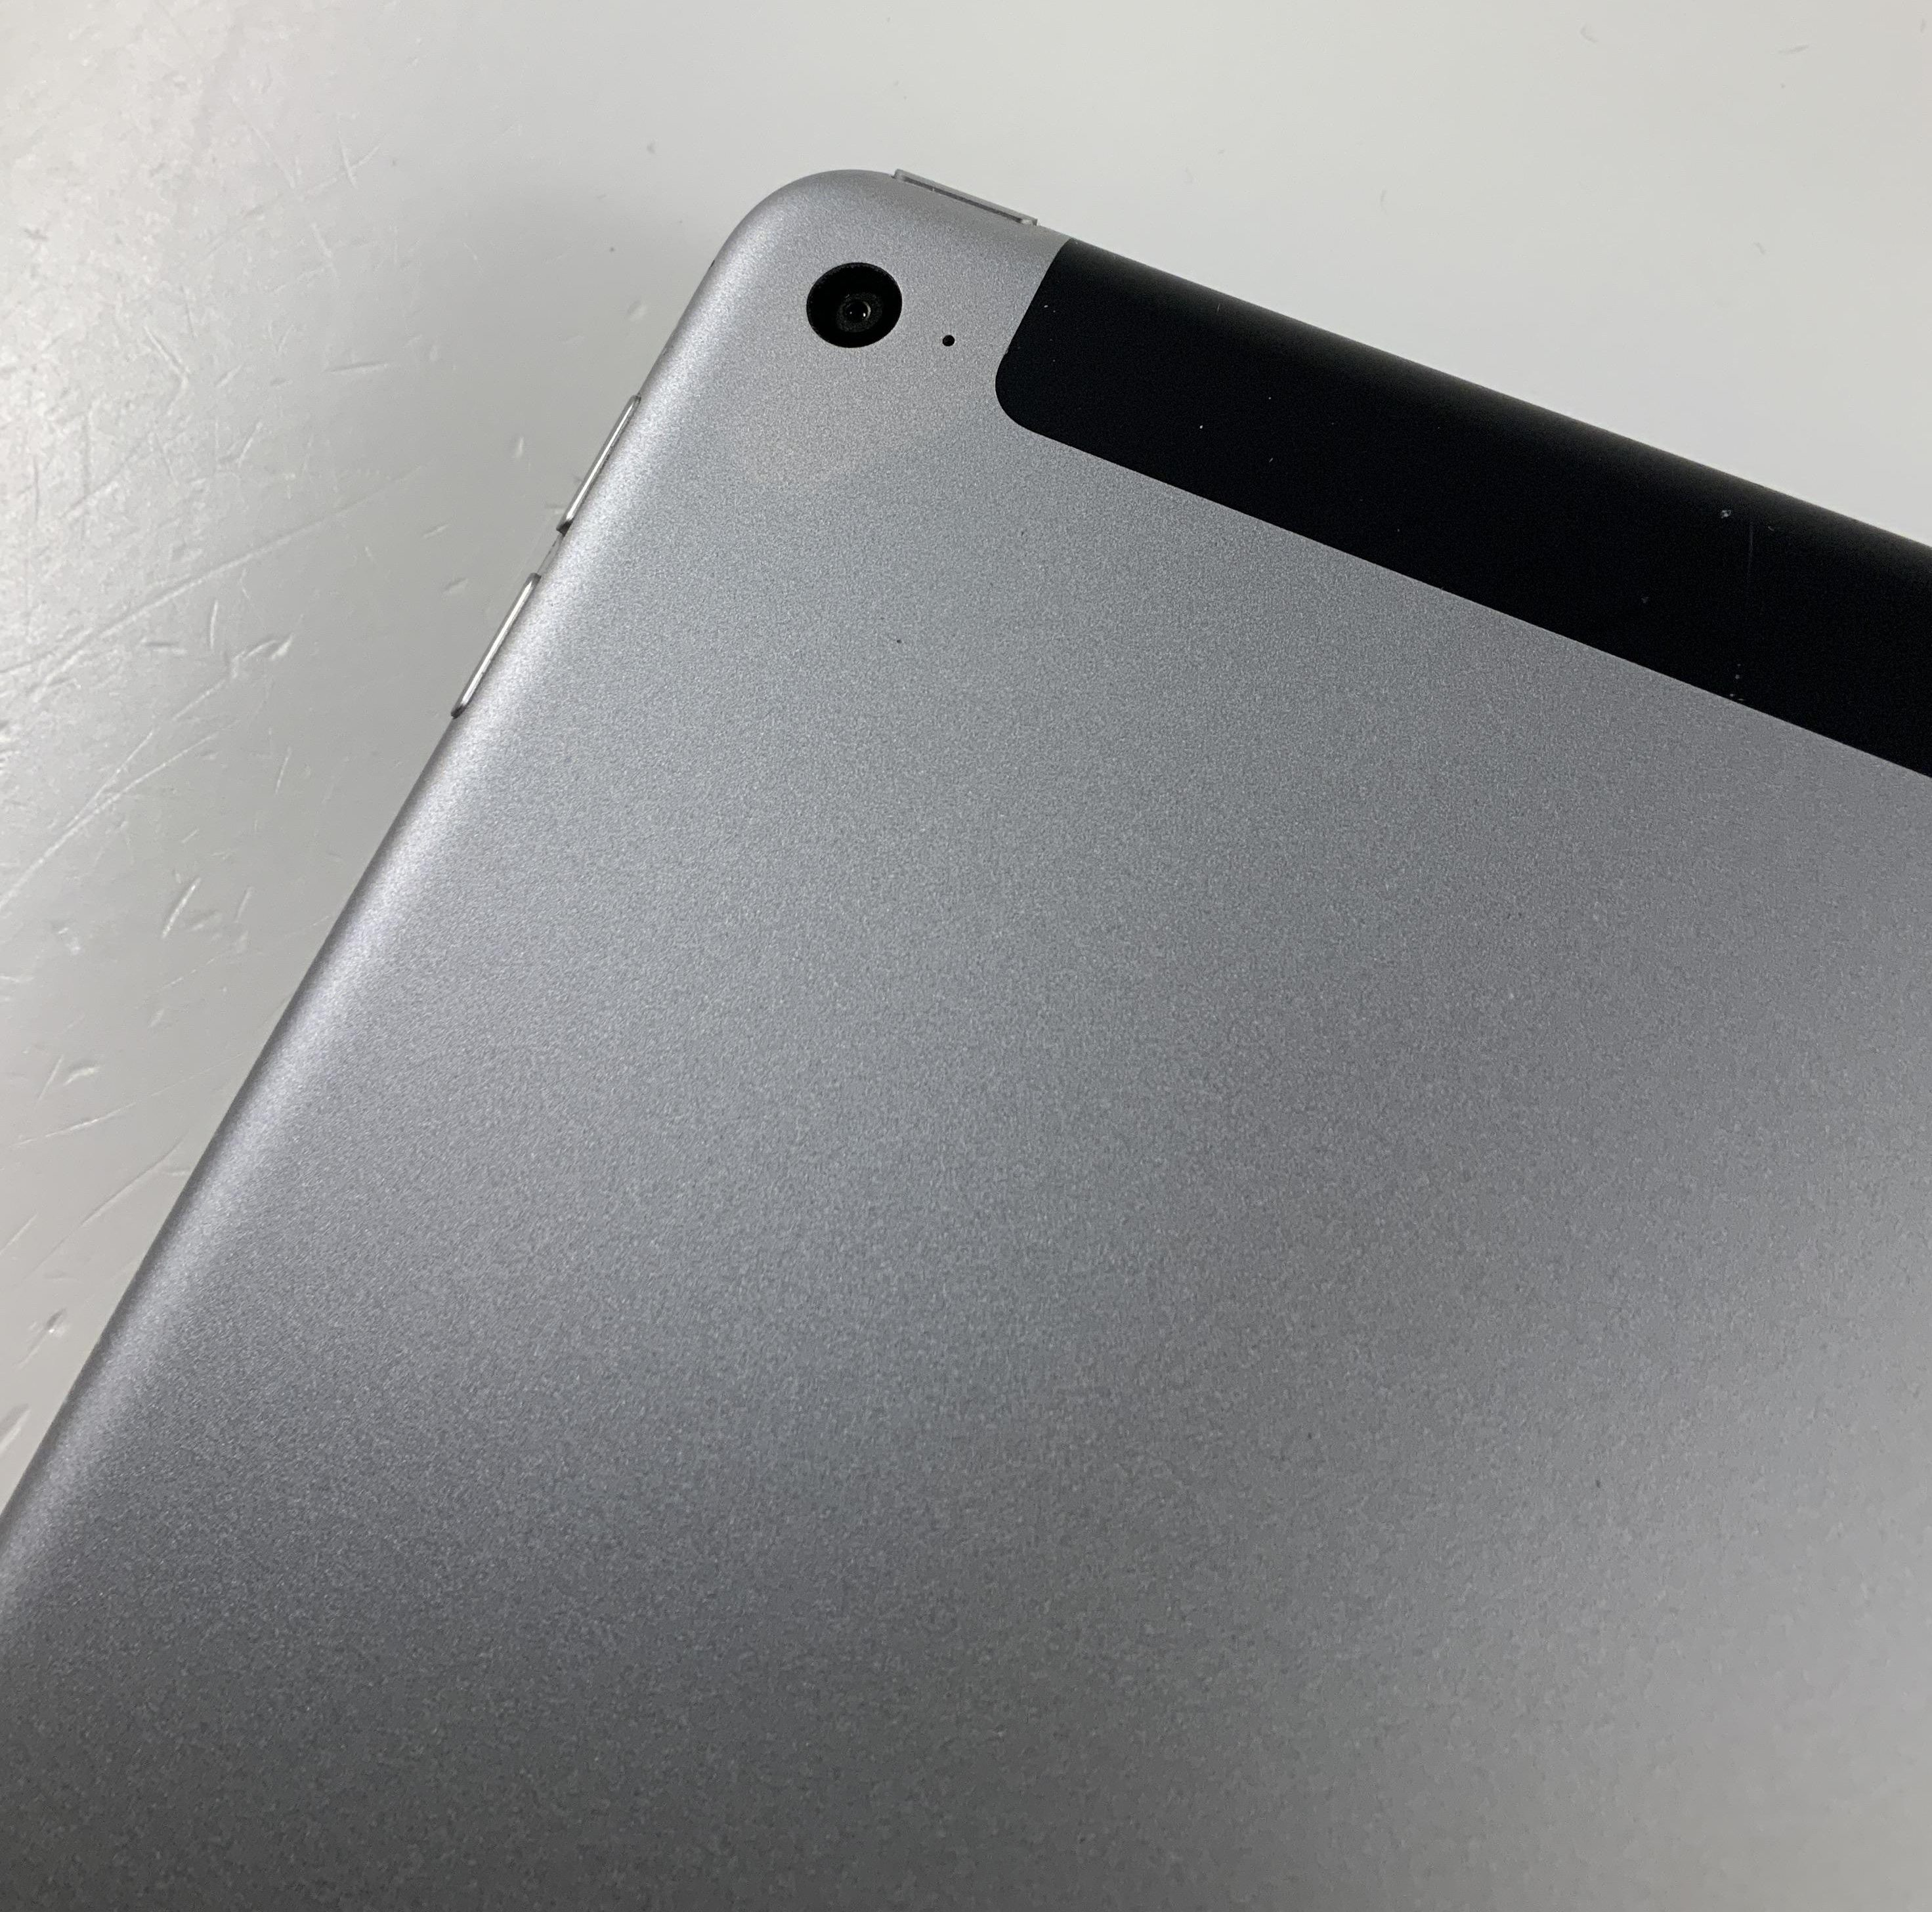 iPad Air 2 Wi-Fi + Cellular 64GB, 64GB, Space Gray, image 3